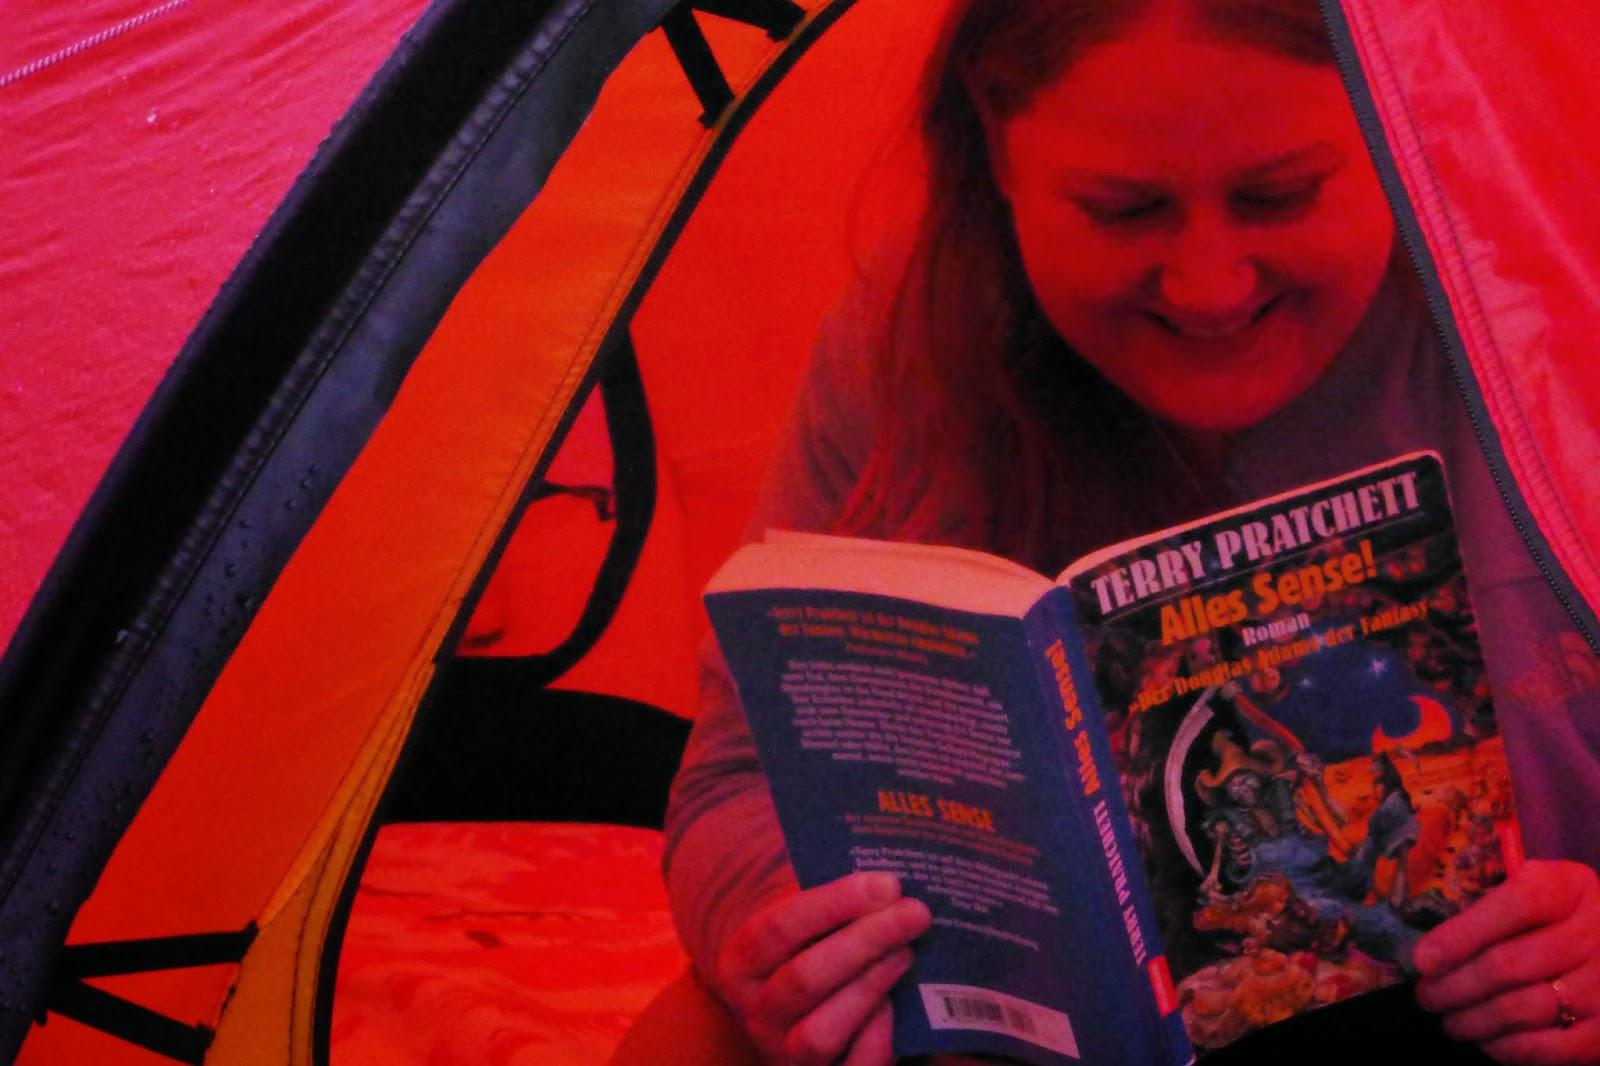 Lesen: Terry Pratchett